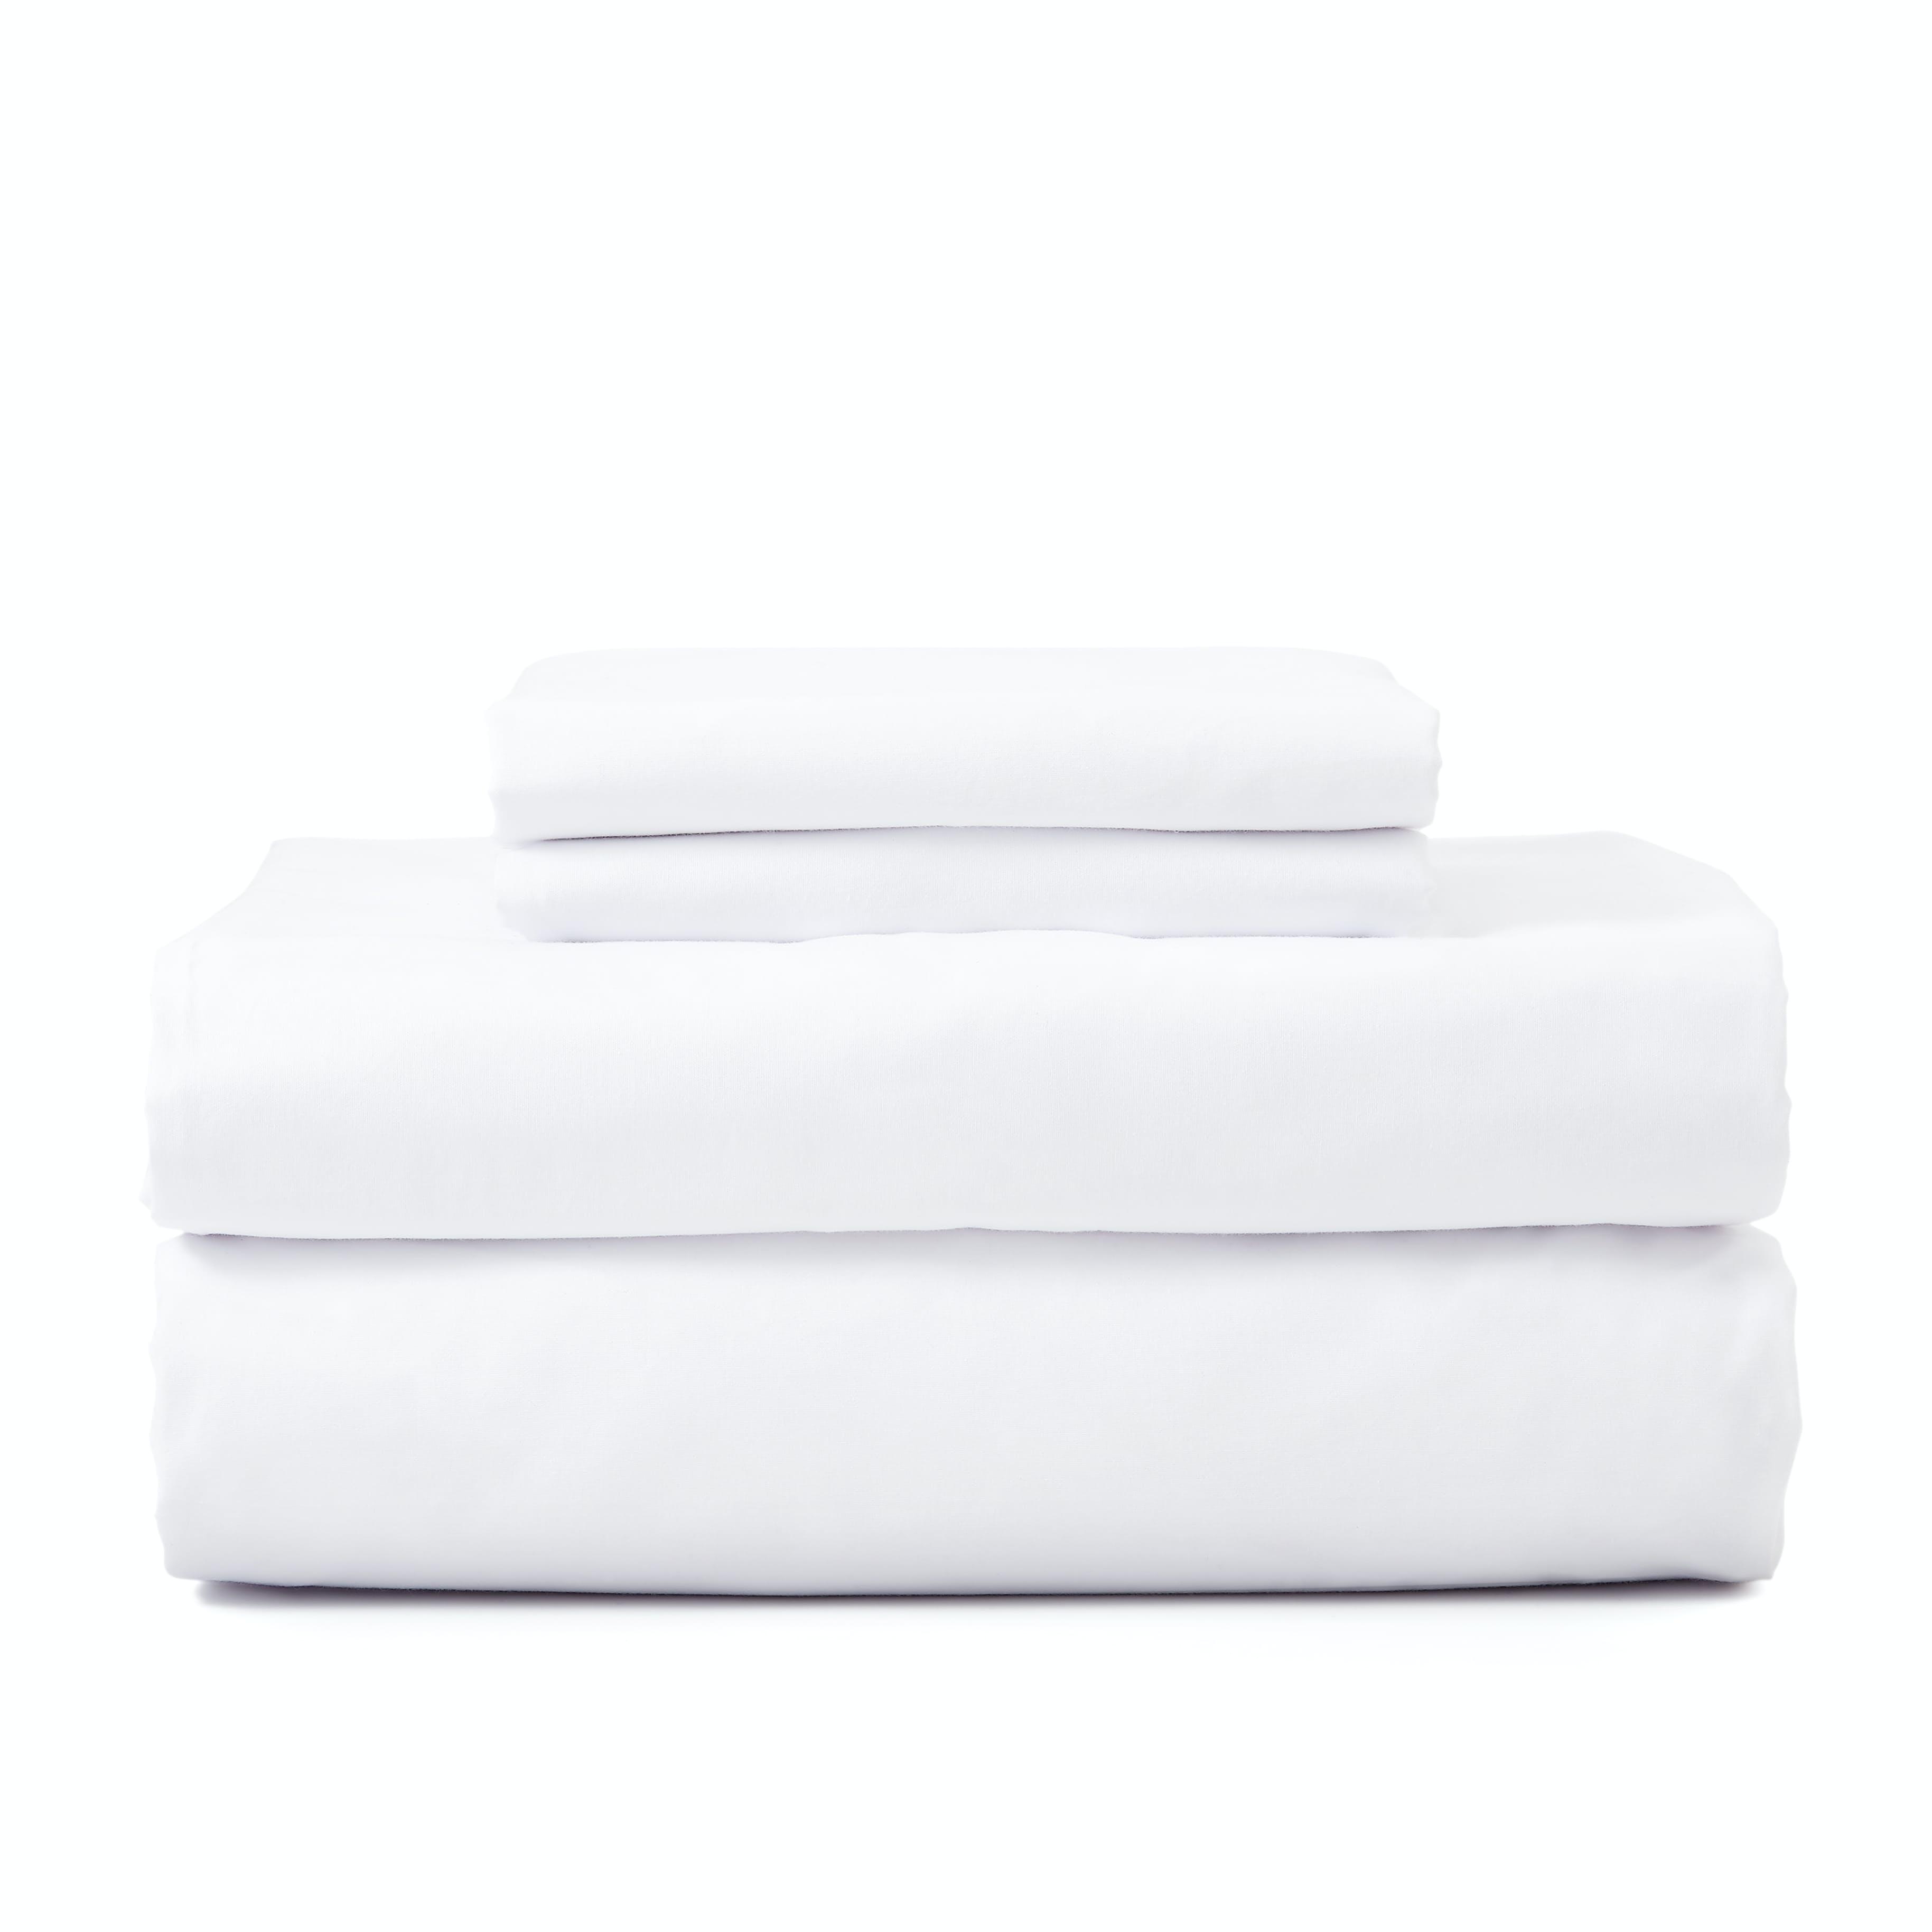 V6pjplyy7v wright american cotton sheet set queen 0 original